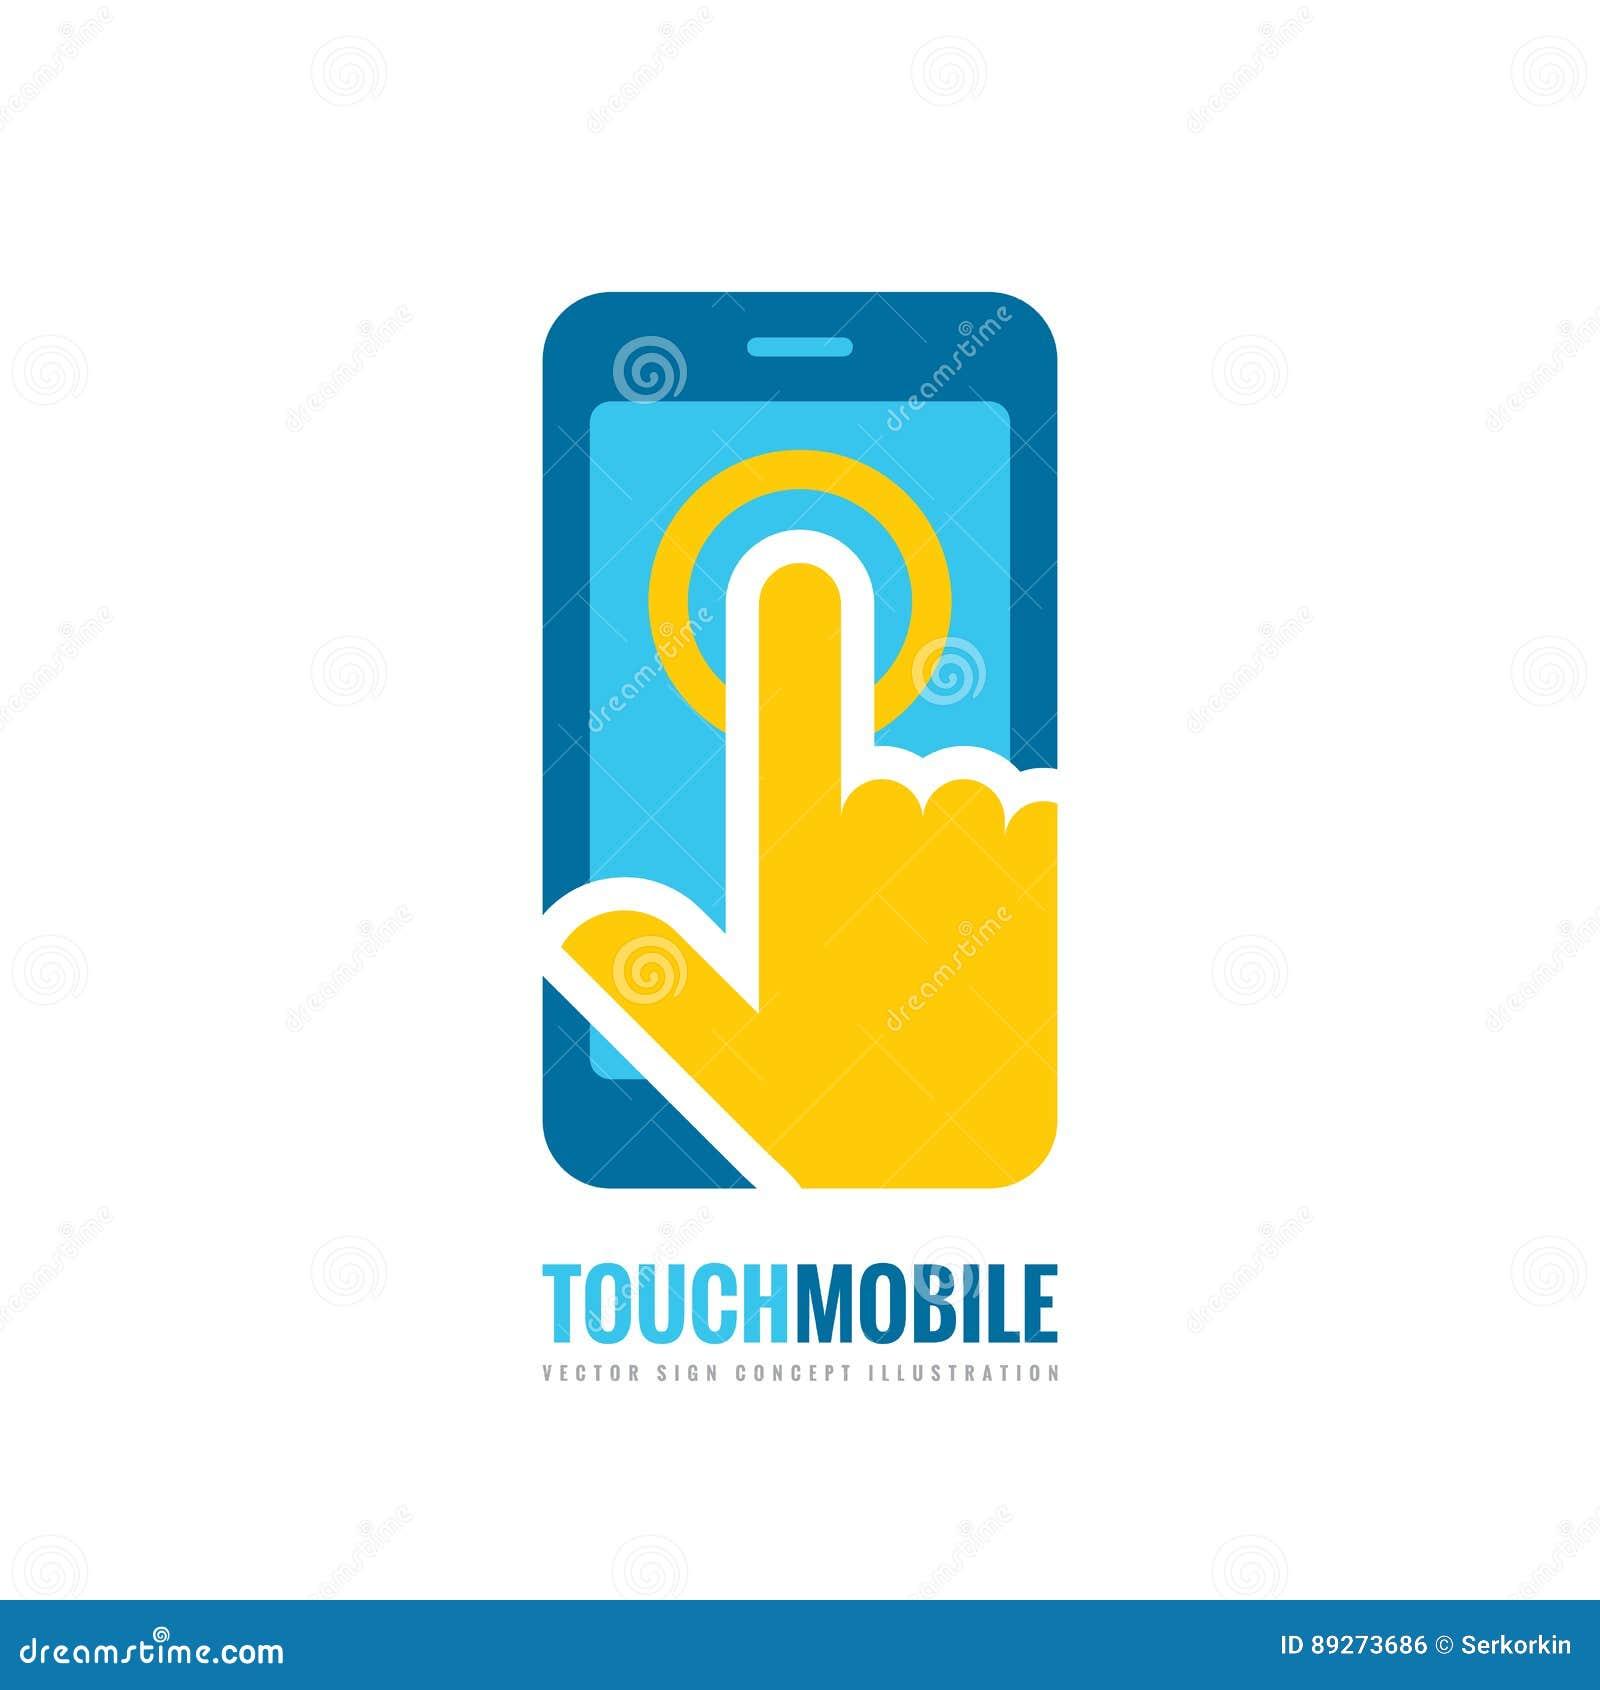 Mobile Phone Vector Logo Template Concept Illustration Smartphone